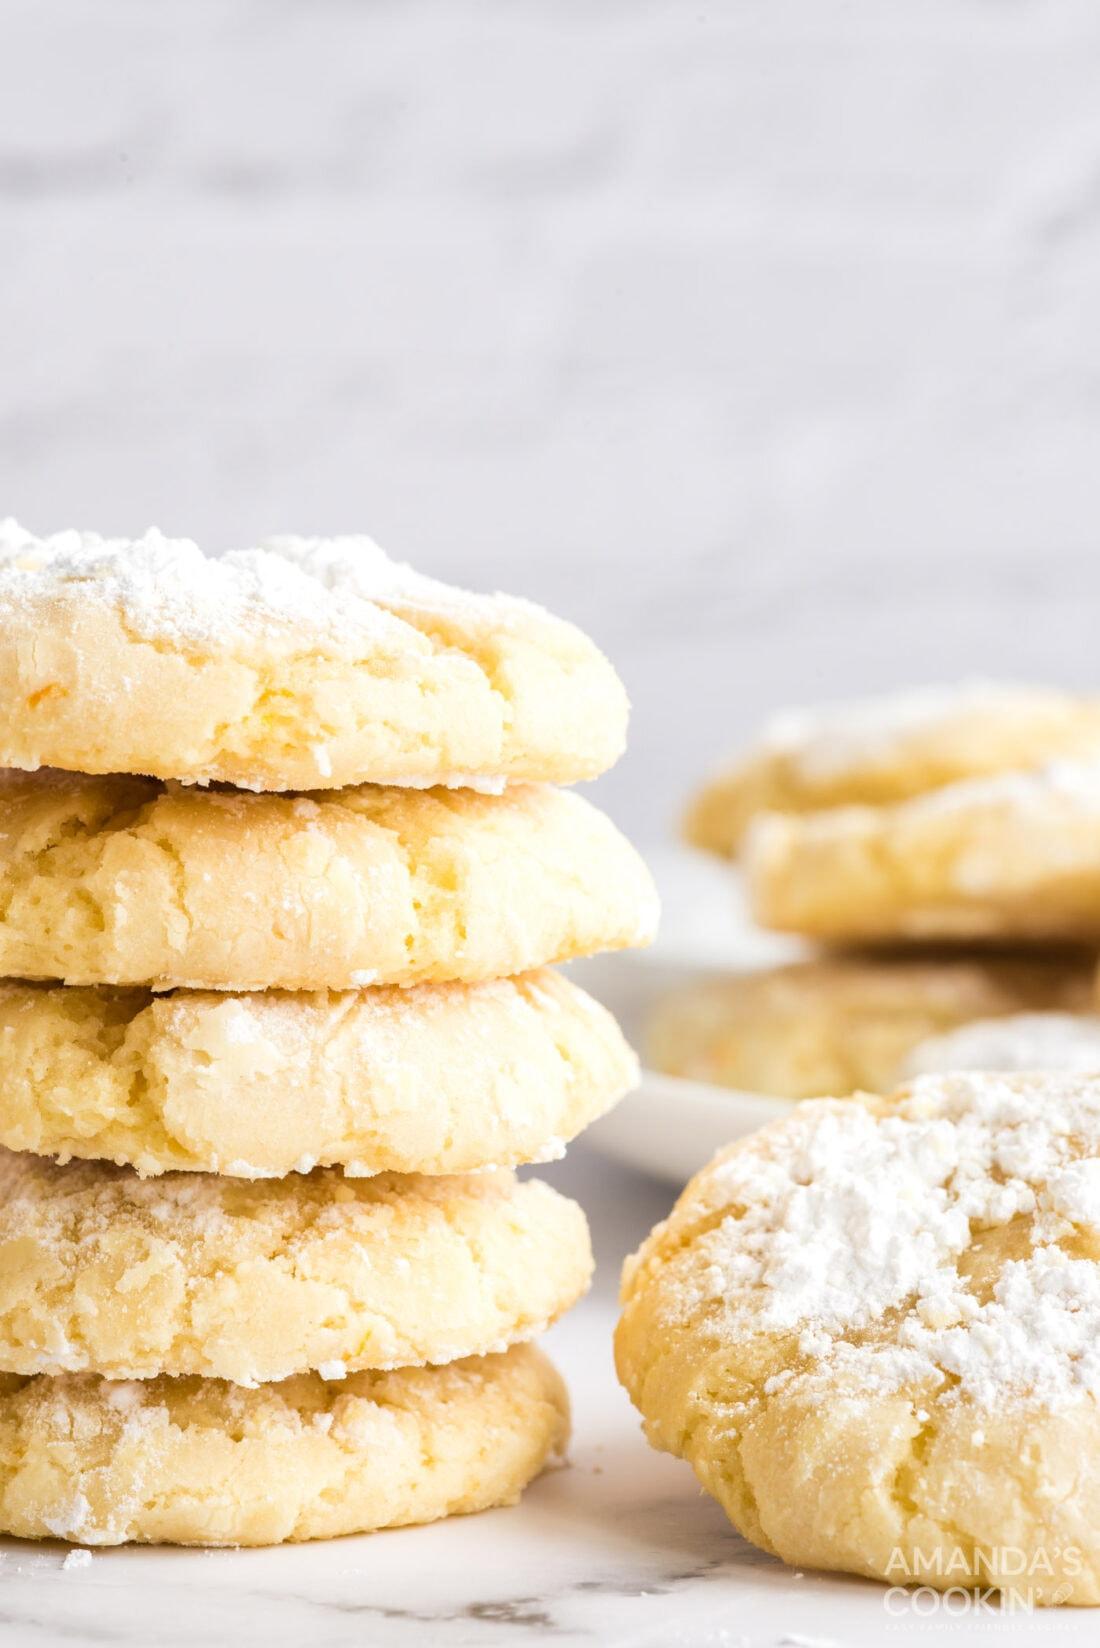 orange crinkle cookies on a plate